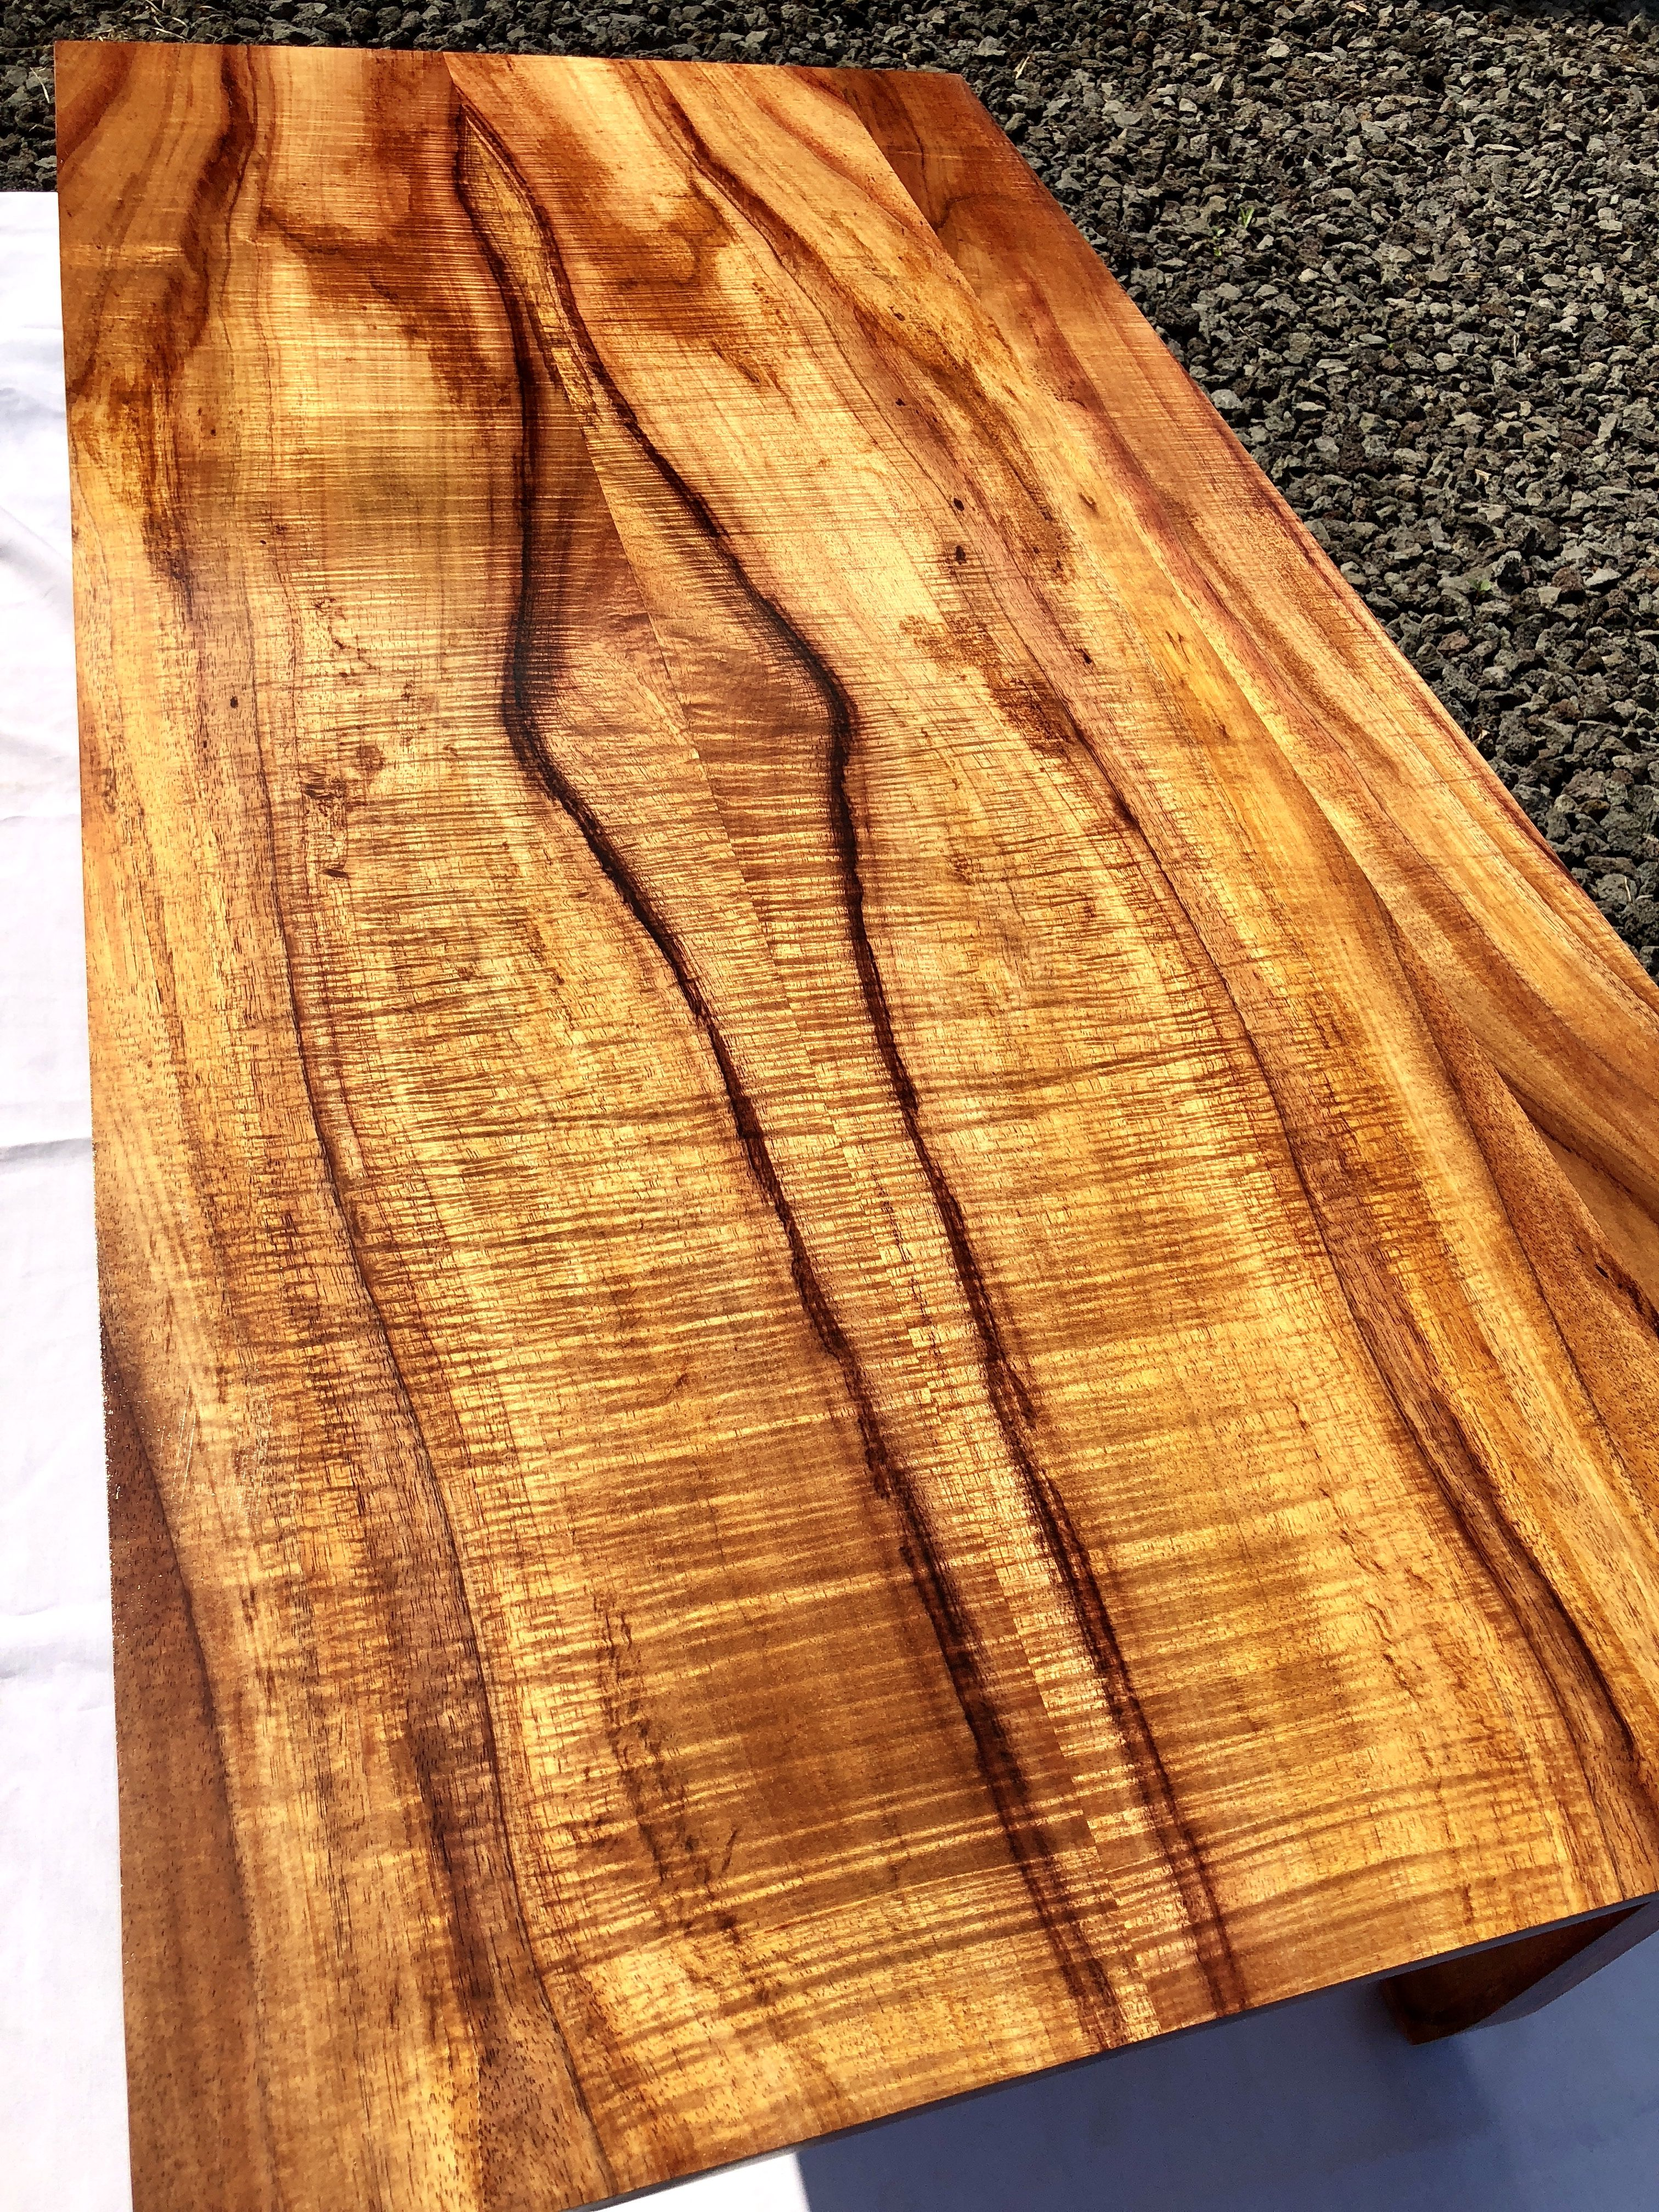 Amazing Curly Koa Wood Table Top By Lewiskoa Co Koa Wood Koa Custom Woodworking [ 4032 x 3024 Pixel ]